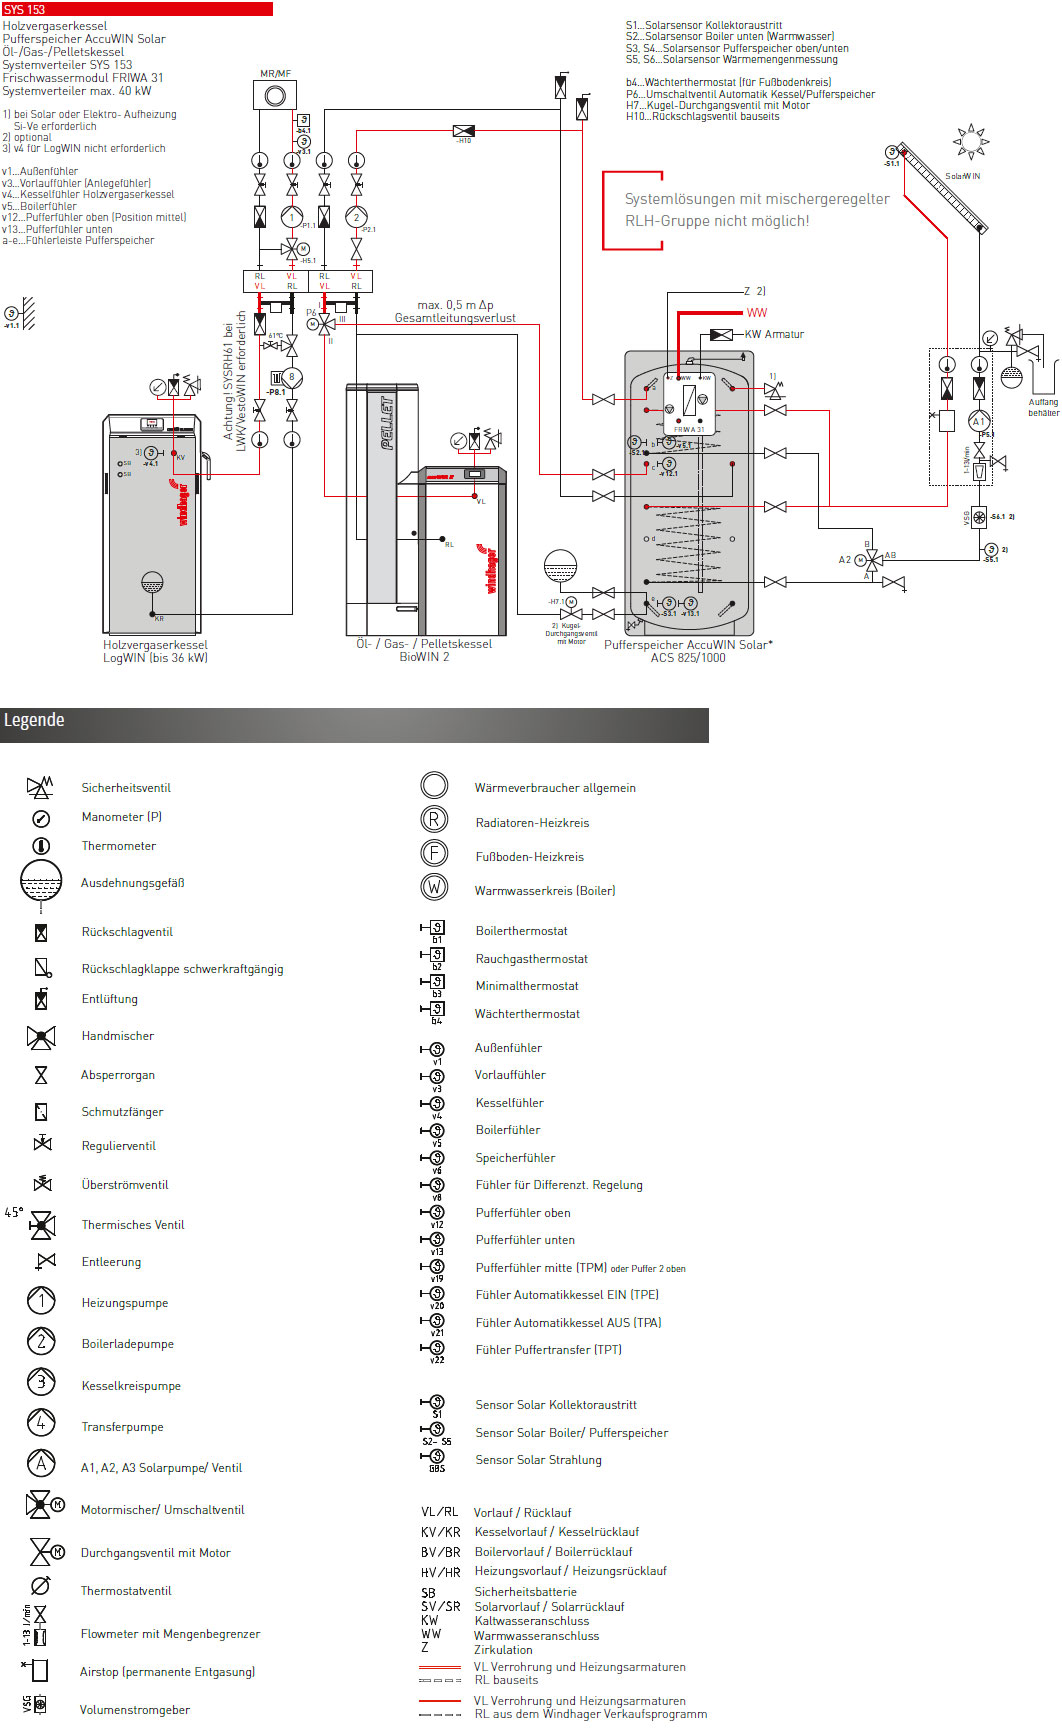 windhager systeml sung sys153 1 holzvergaserkessel 1 l gas pelletkessel 1 pufferspeicher. Black Bedroom Furniture Sets. Home Design Ideas